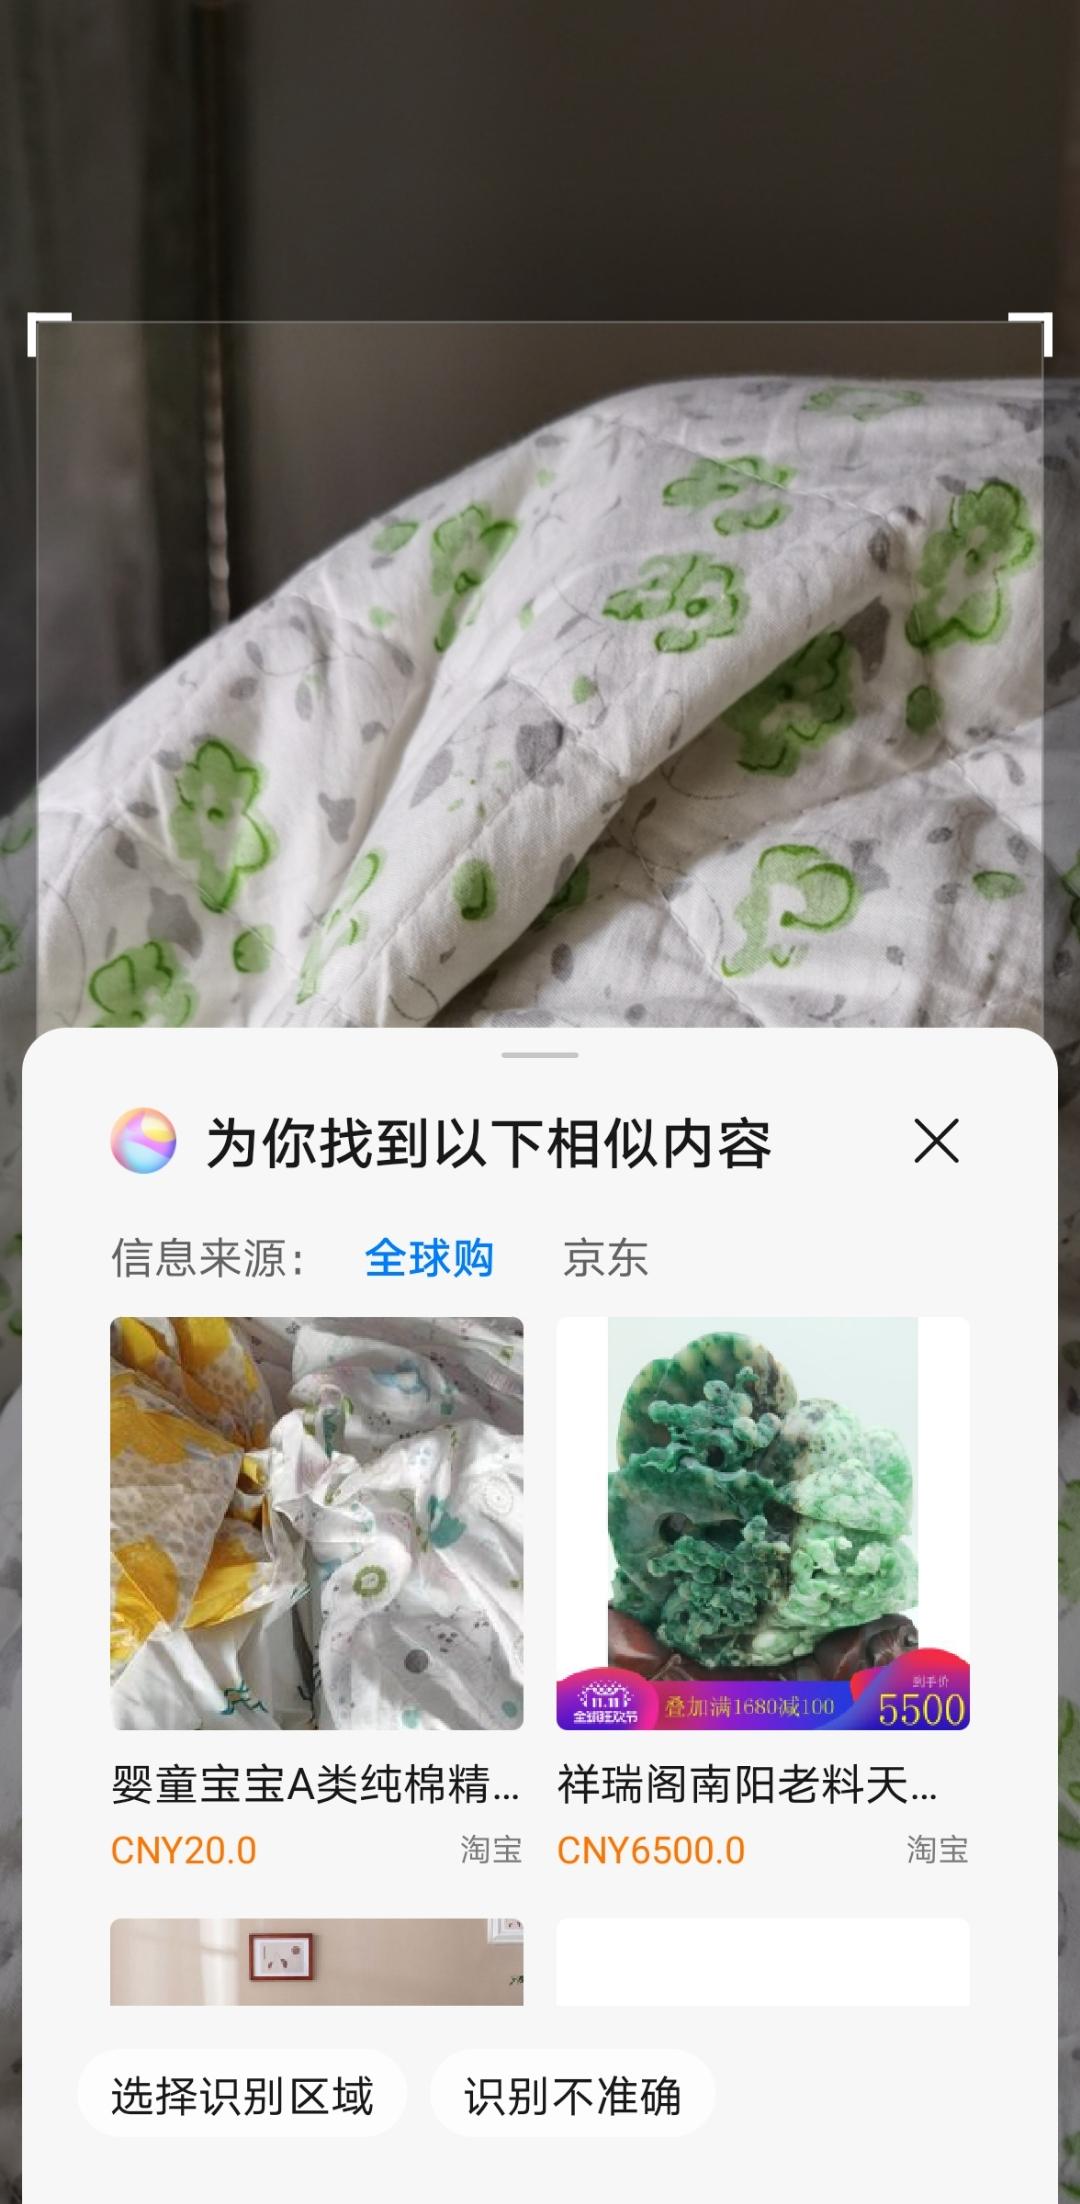 Screenshot_20200514_055521_com.huawei.scanner.jpg